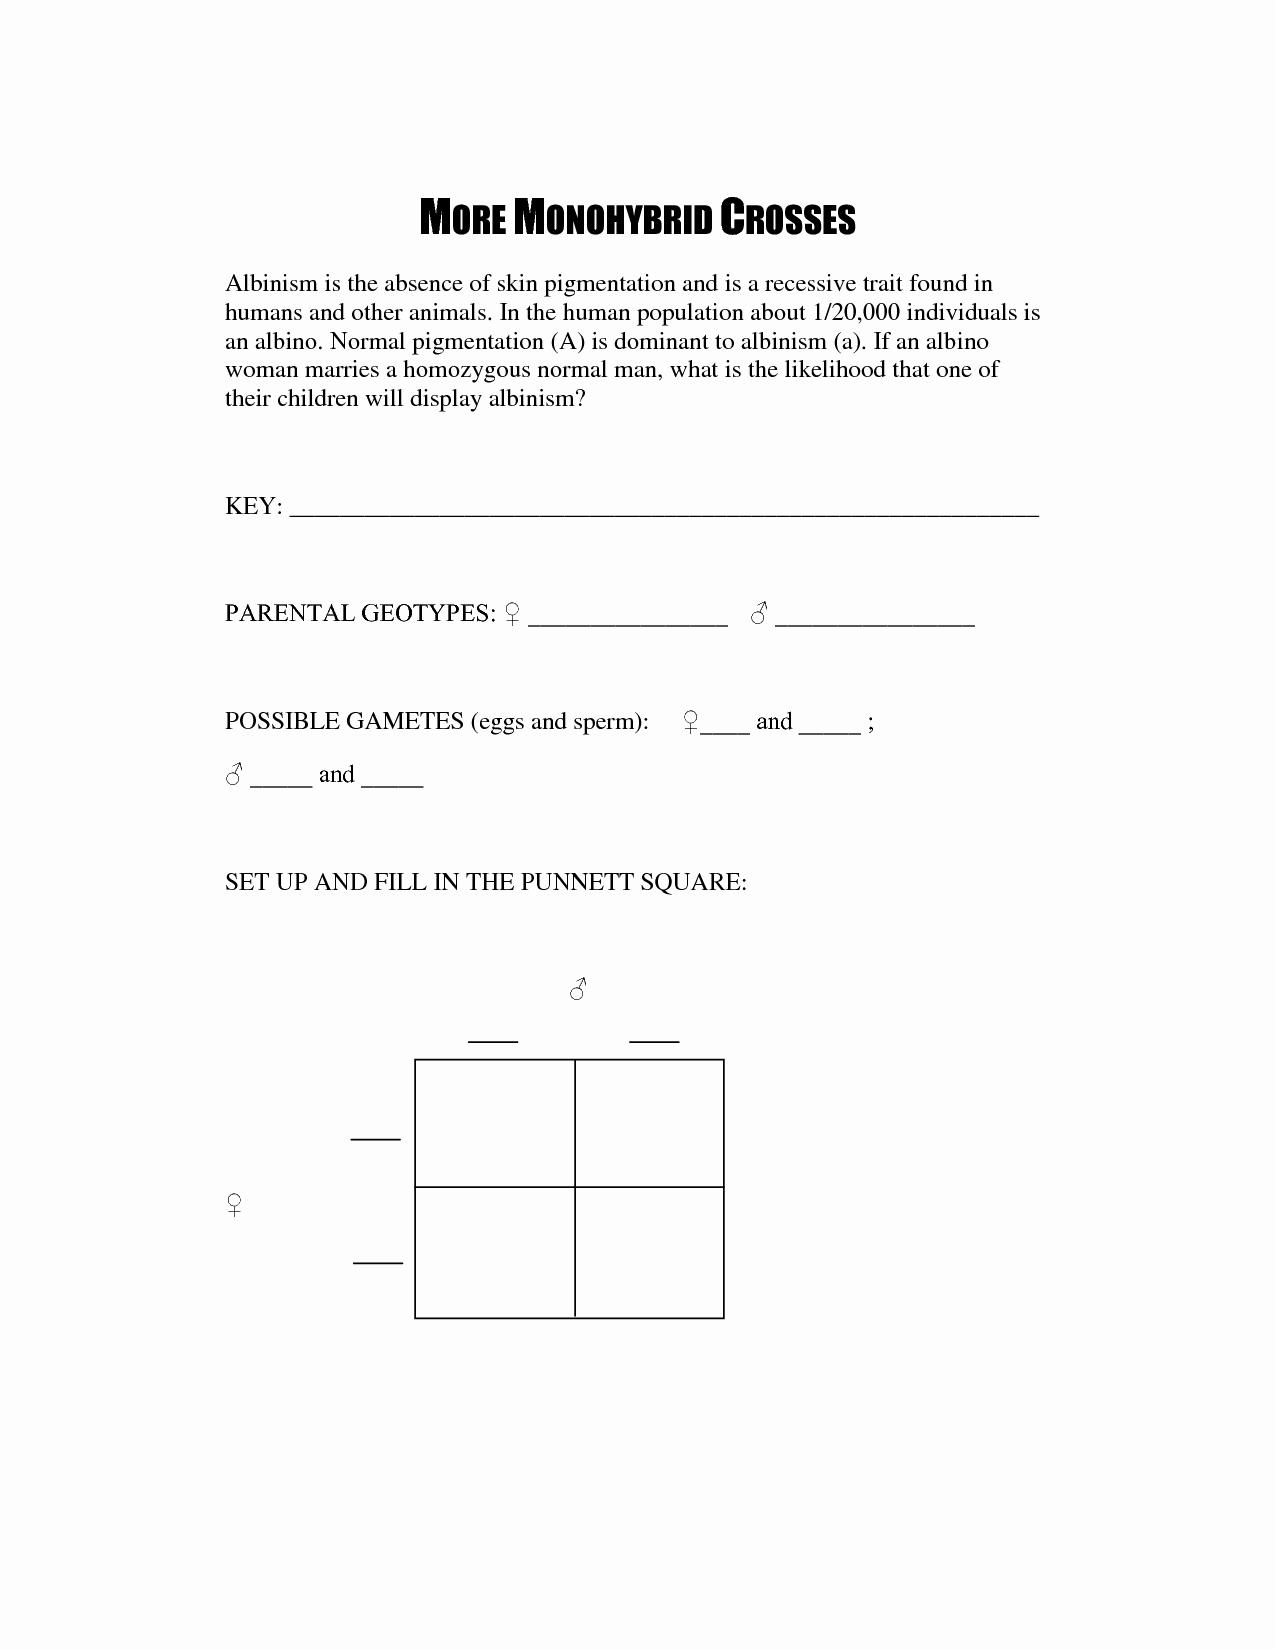 Monohybrid Cross Practice Problems Worksheet Beautiful 14 Best Of Monohybrid Cross Worksheet Answer Key